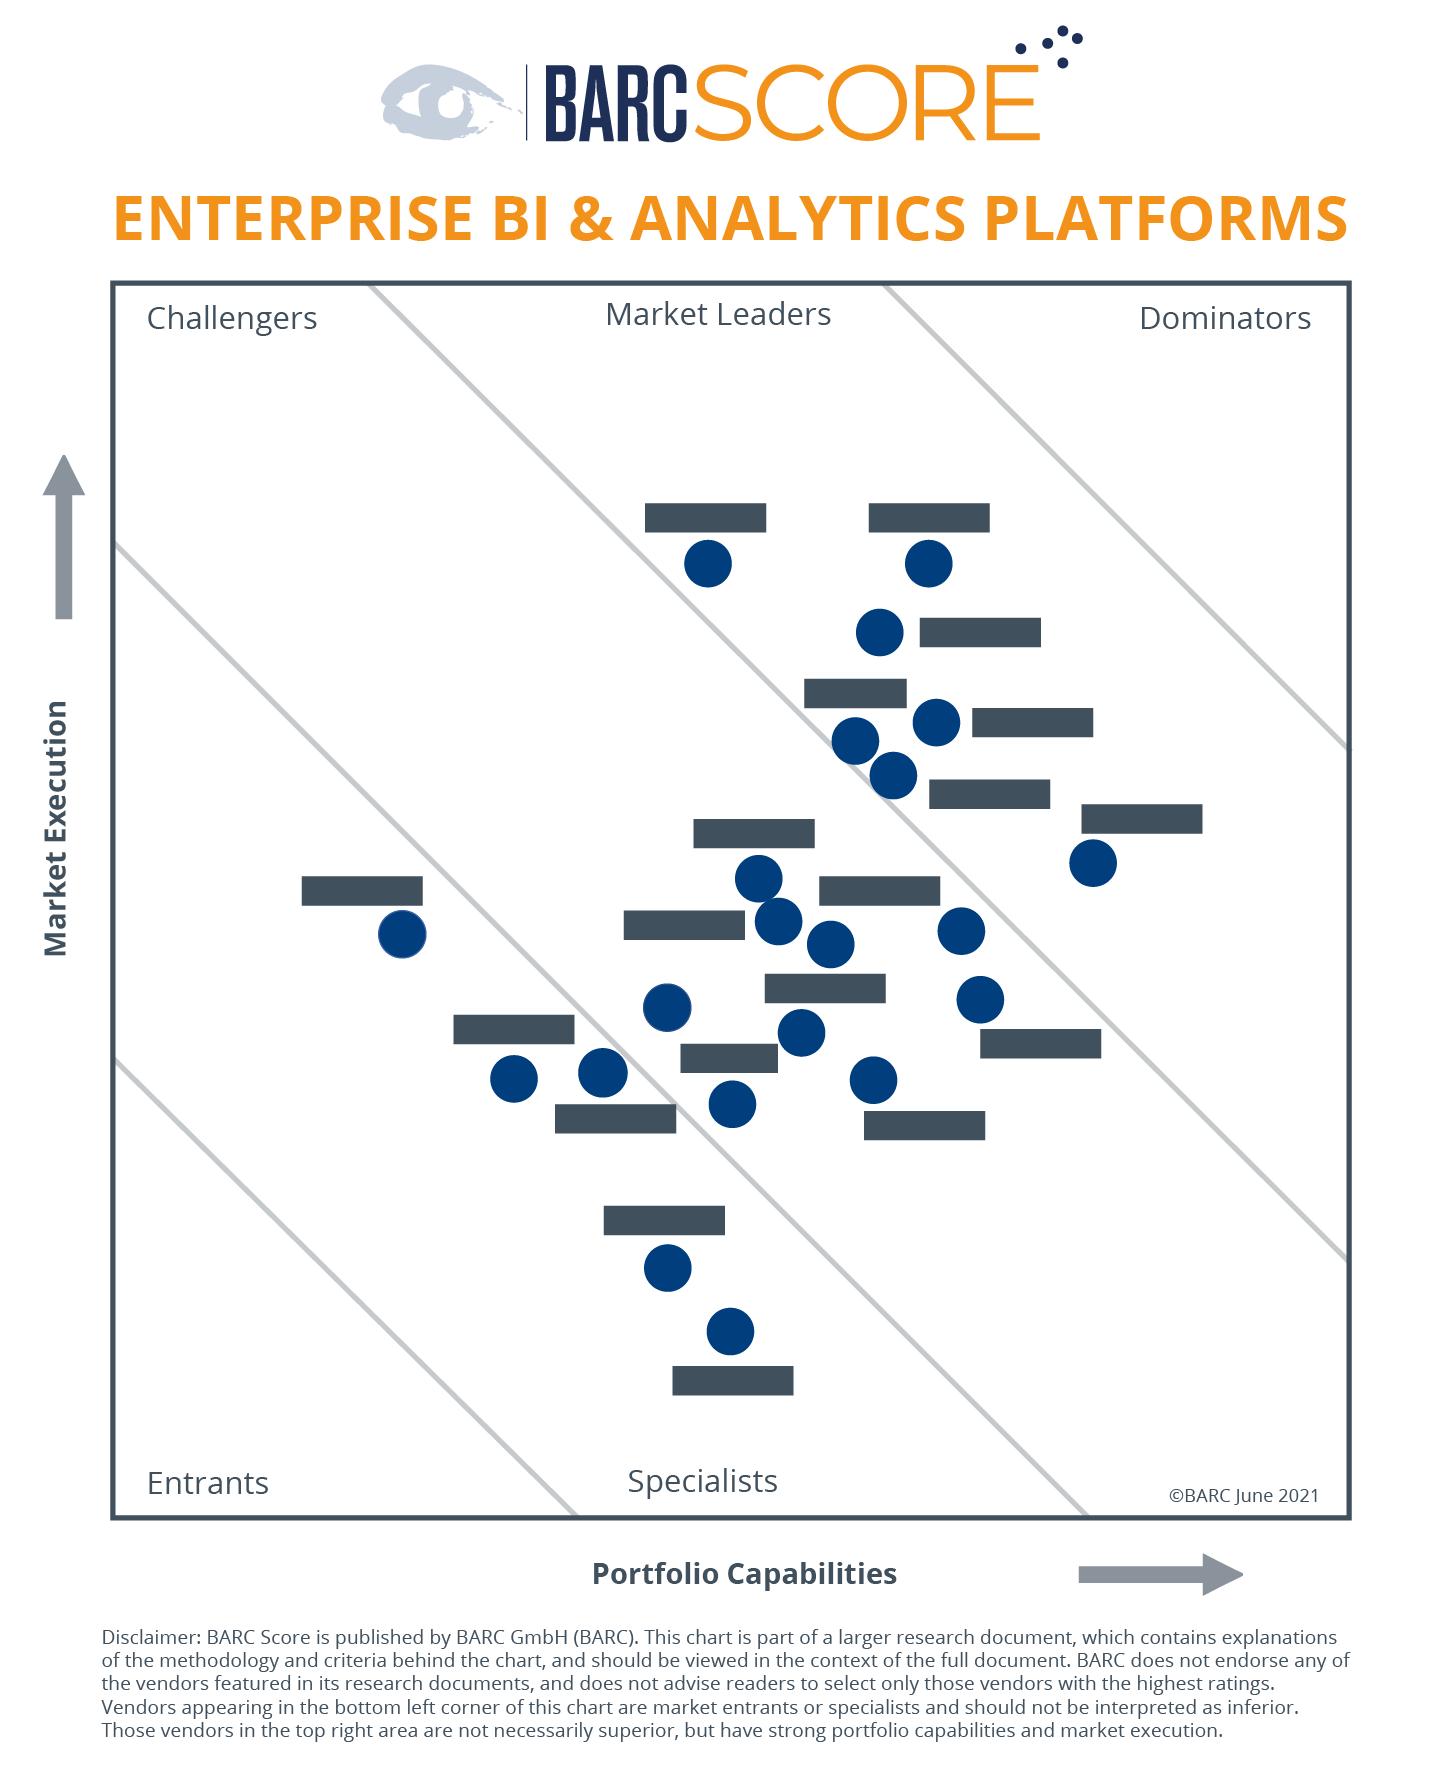 BARC Score Enterprise BI & Analytics Platforms 2021